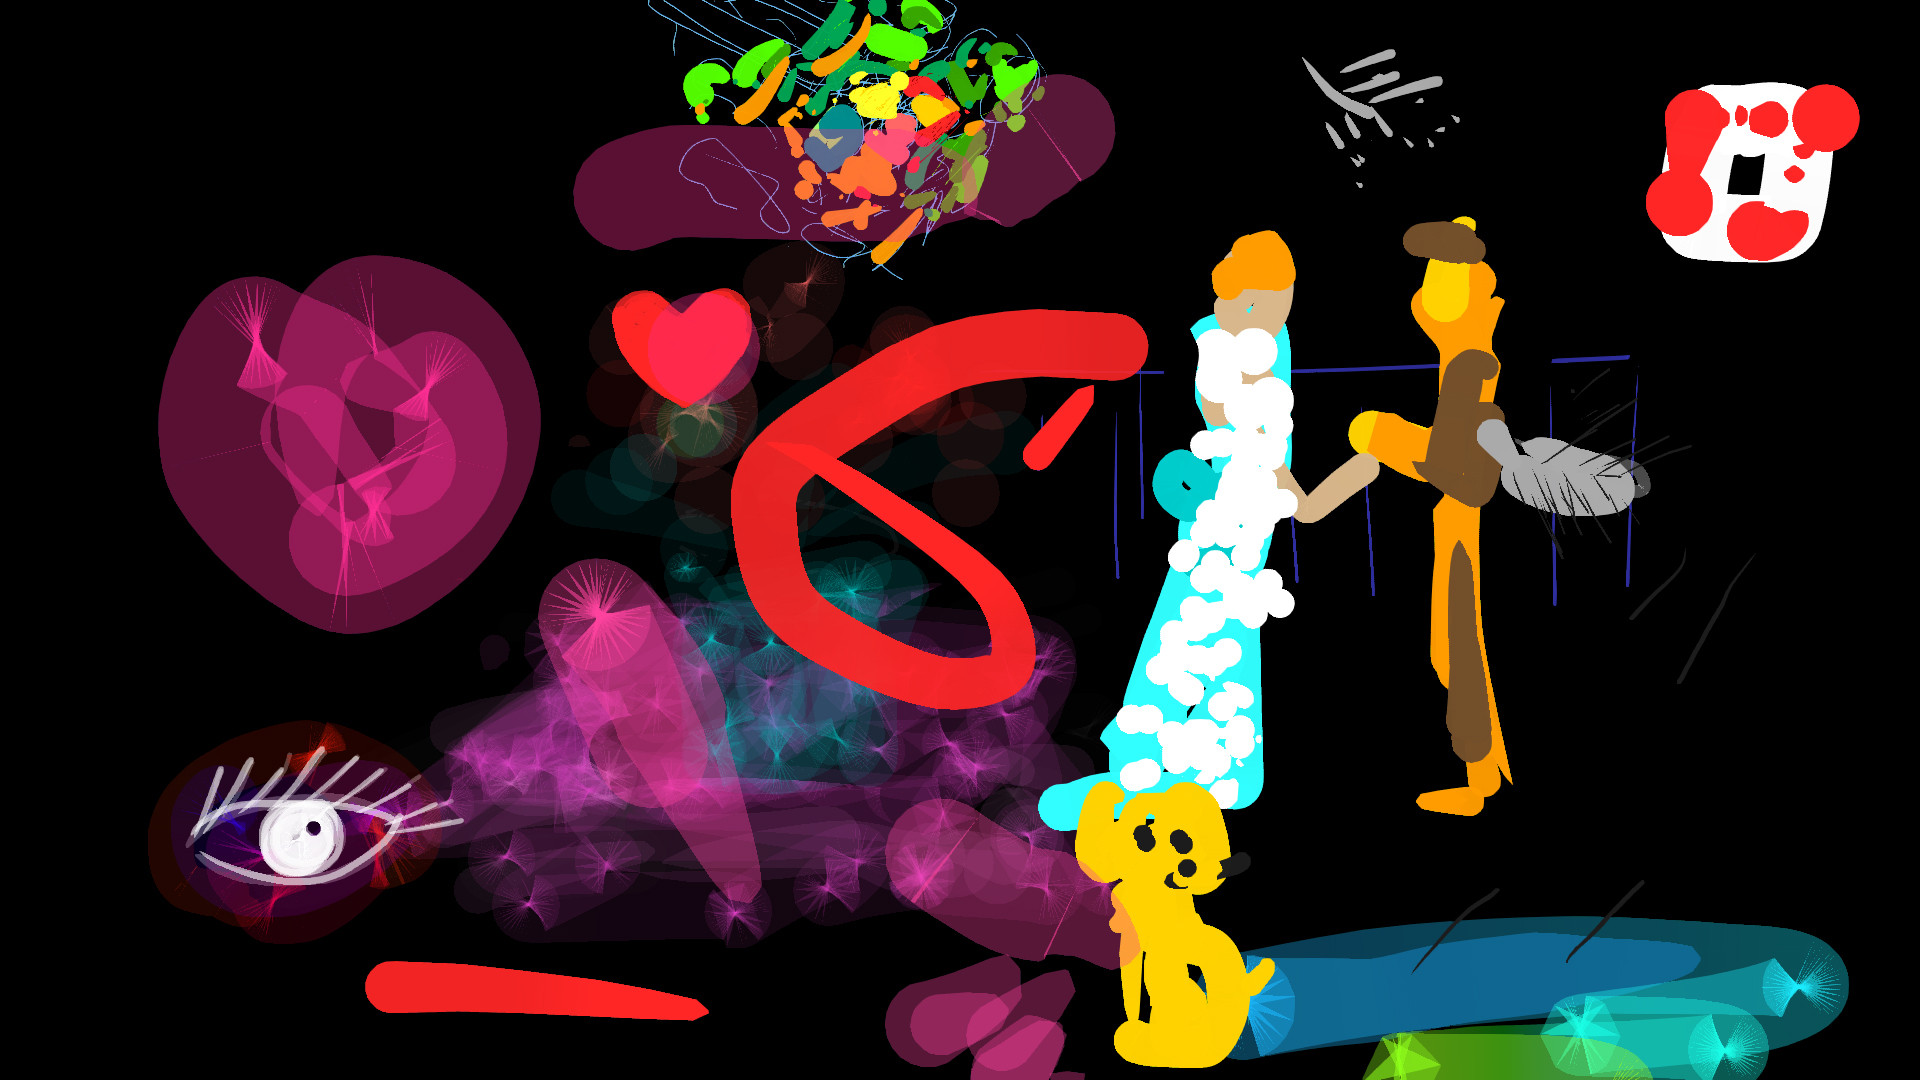 IMG_0487_black_background.jpg